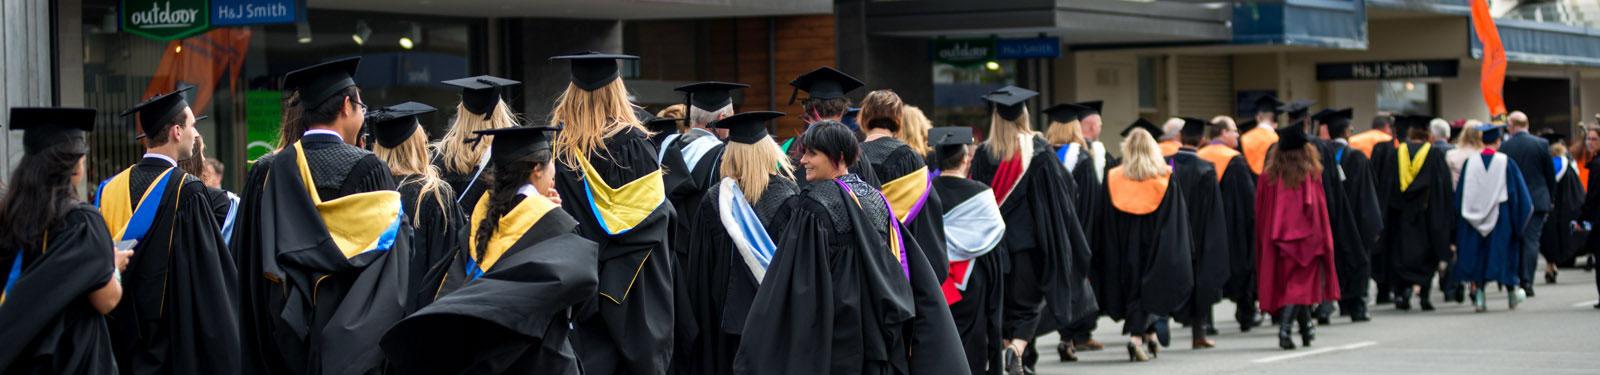 Graduation-march